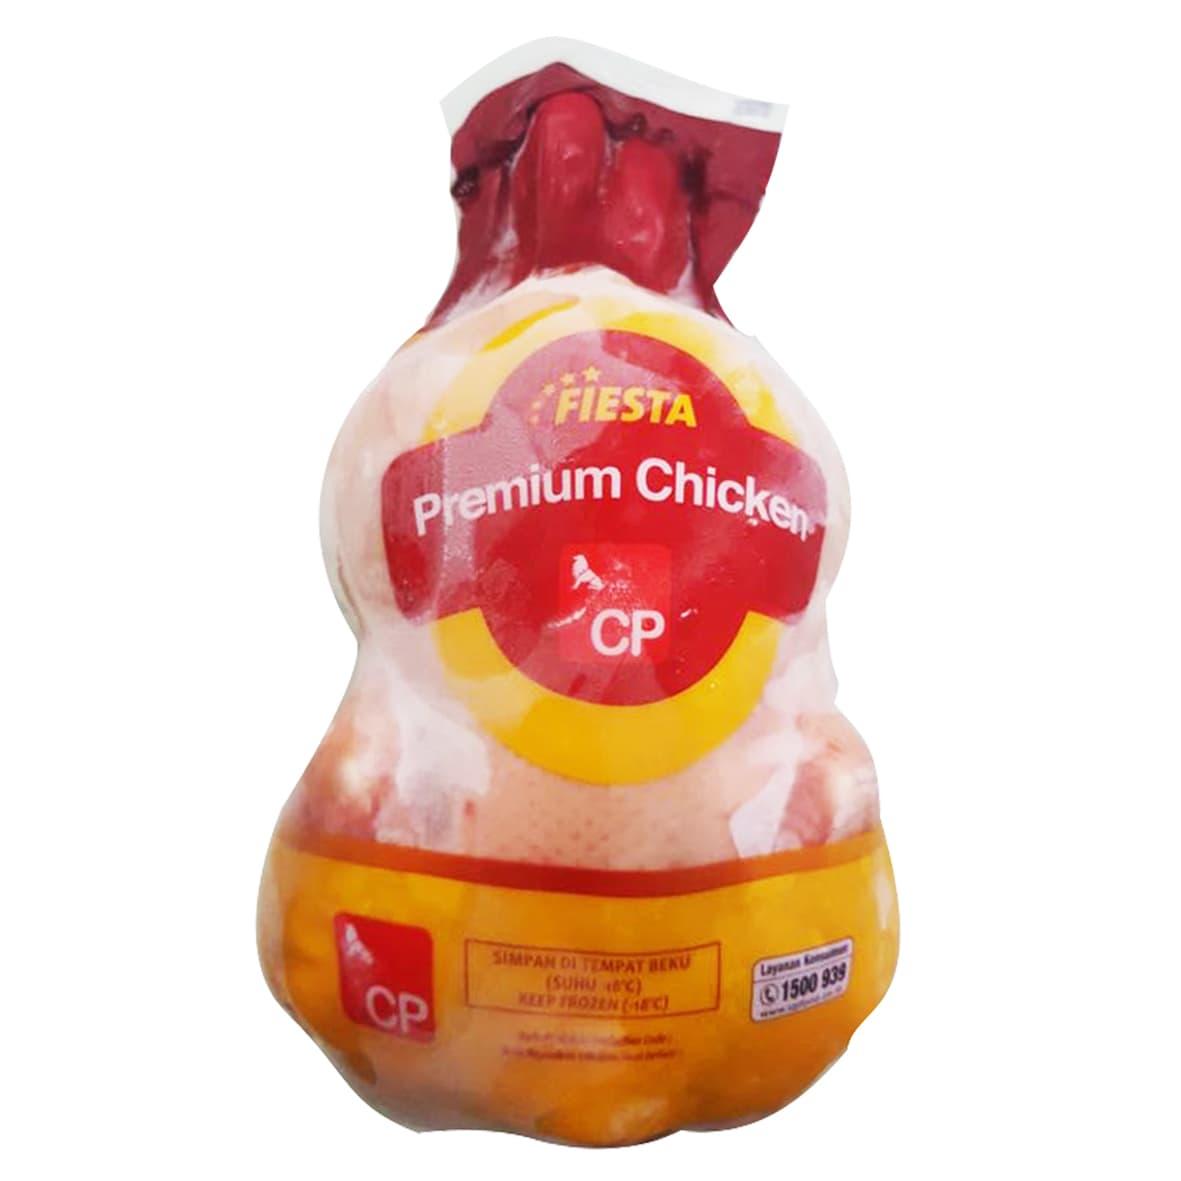 Fiesta Paket Ayam Premium 0.9 - 1.0 Kg (3 Pcs) - Blanja.com